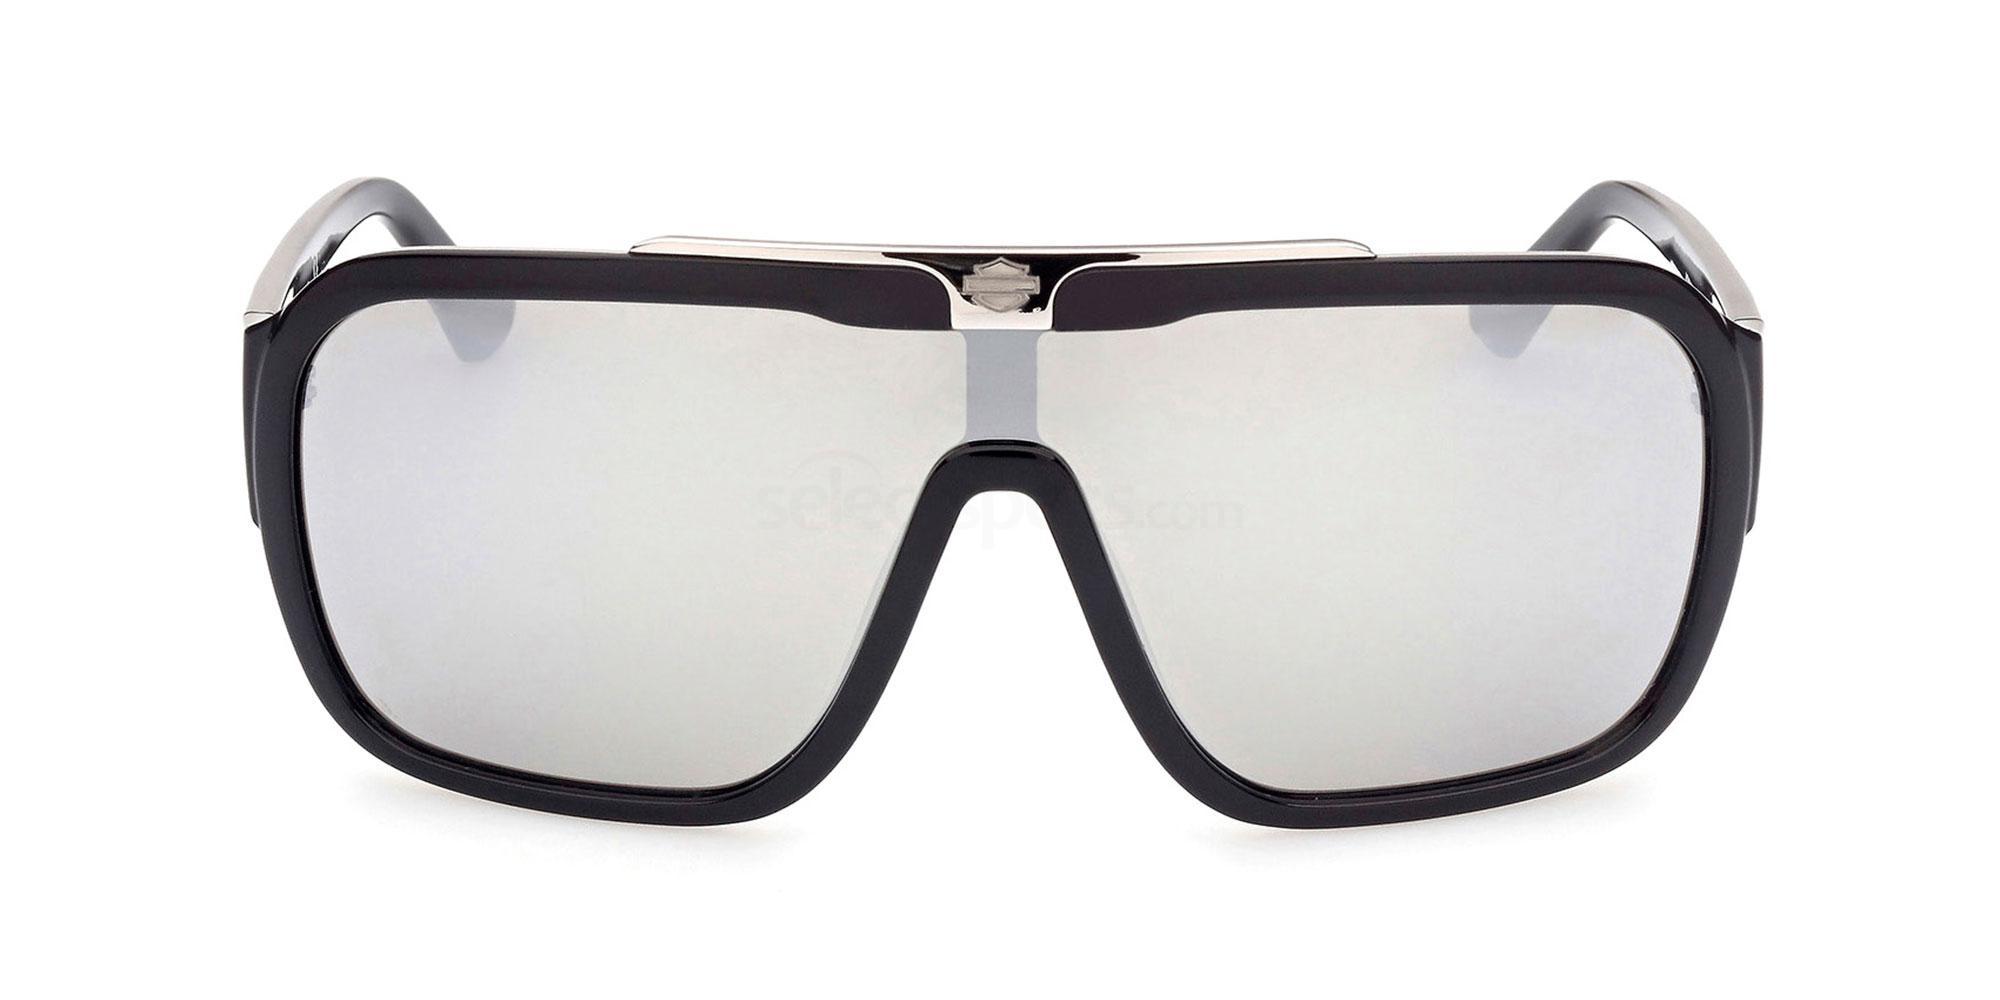 01C HD0948X Sunglasses, Harley Davidson